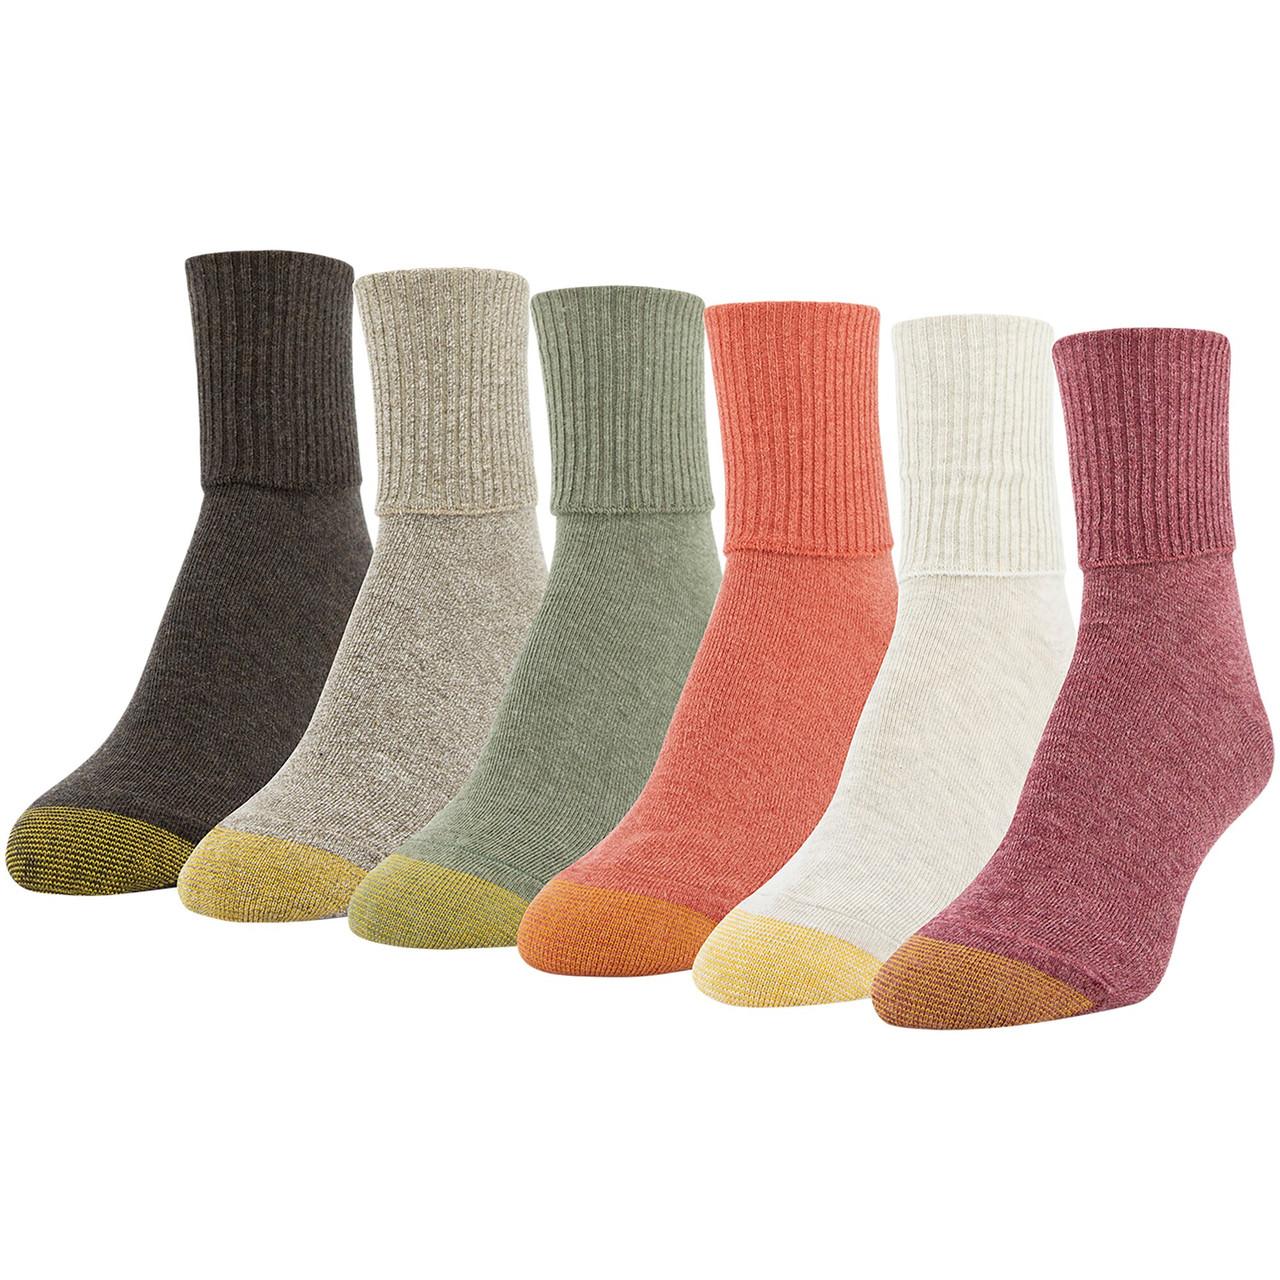 Gold Toe Womens Six-Pack Turn Cuff Socks